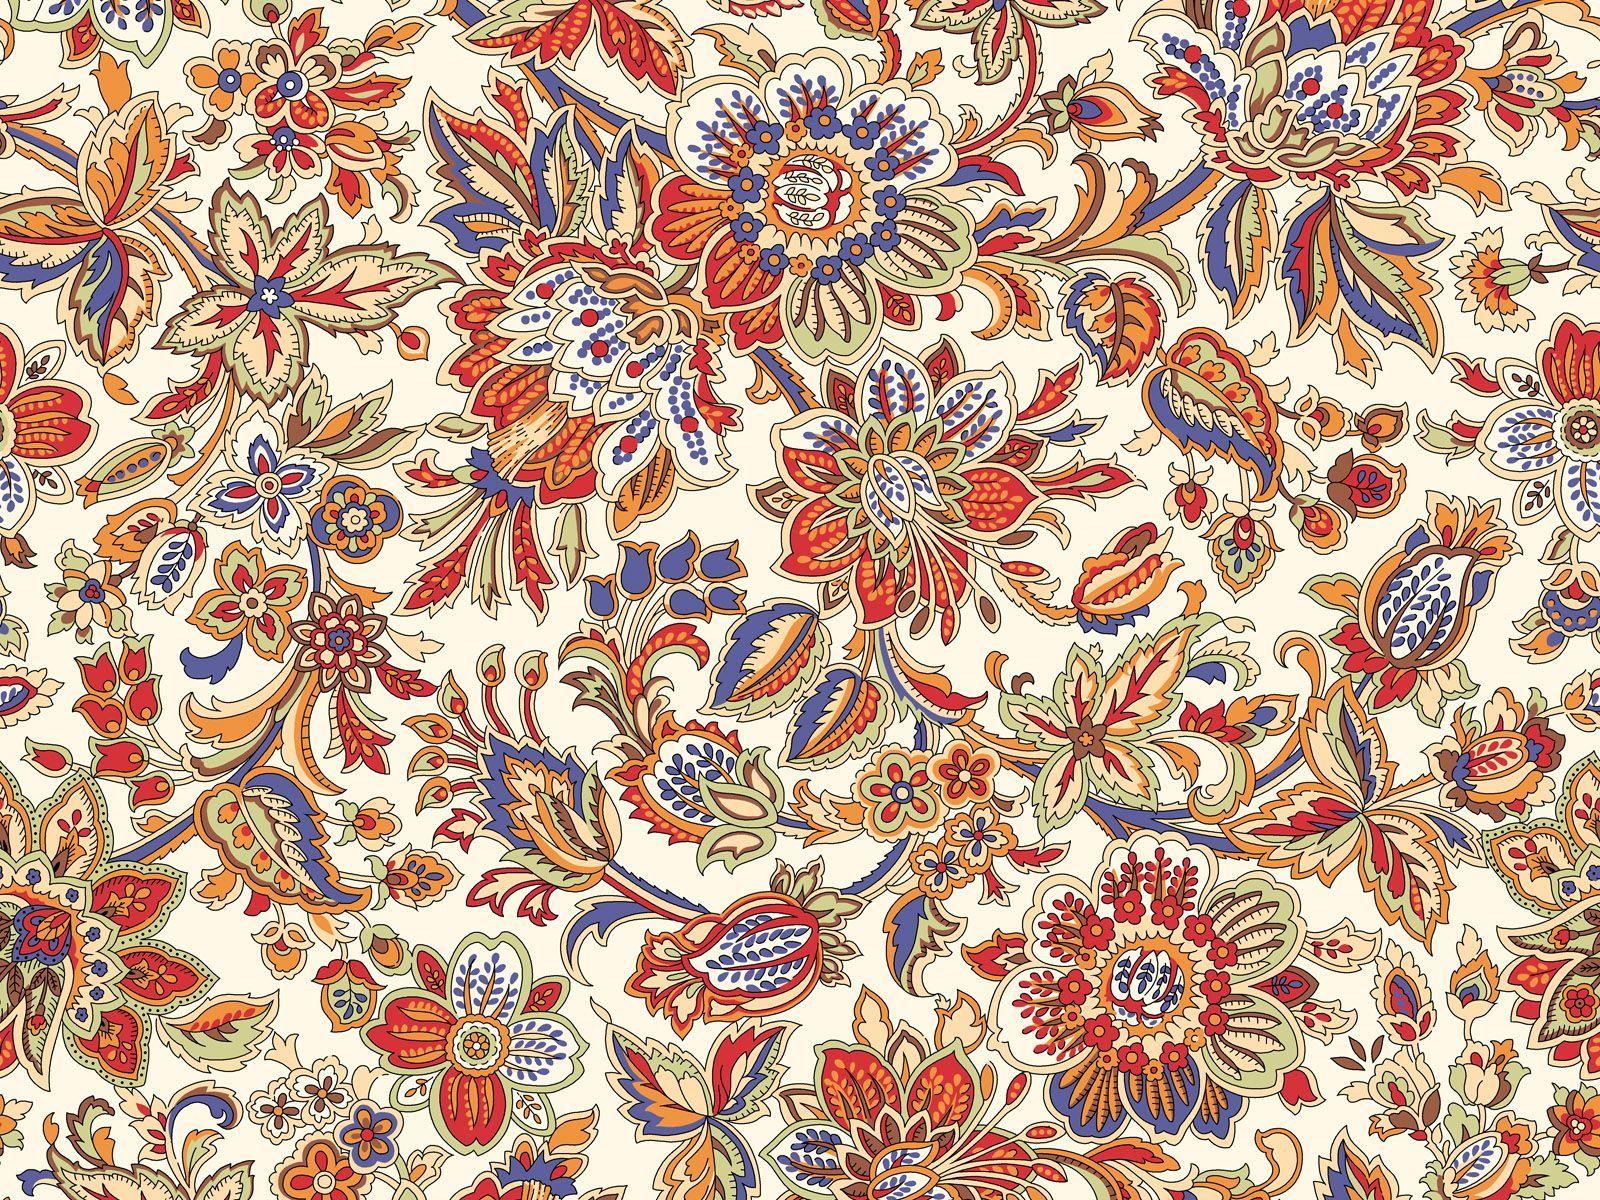 Iphone Background Batik Wallpaper Hd In 2020 Floral Pattern Wallpaper Pattern Wallpaper Background Patterns